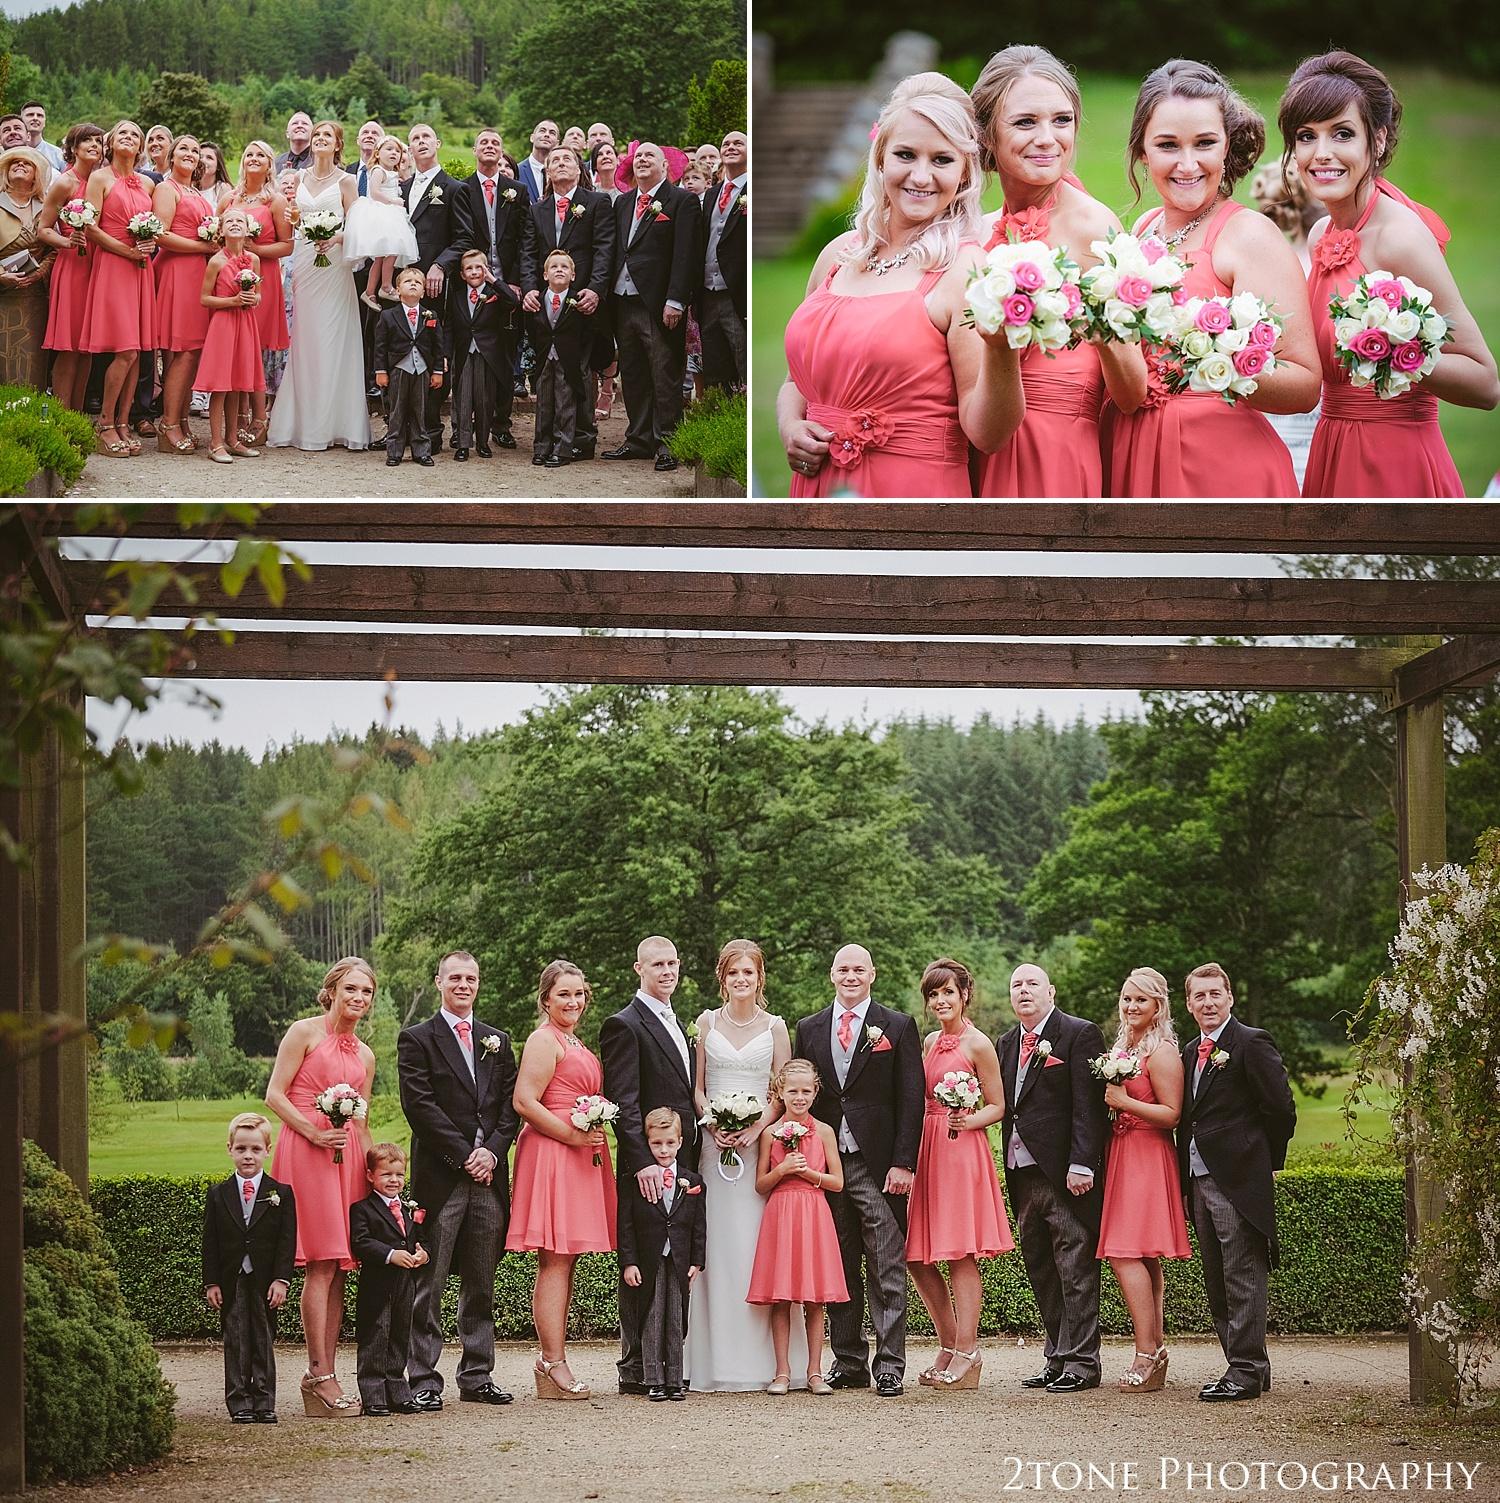 The Bridal party.  Slaley Hall wedding photography by wedding photographers 2tone Photography.  www.2tonephotography.co.uk